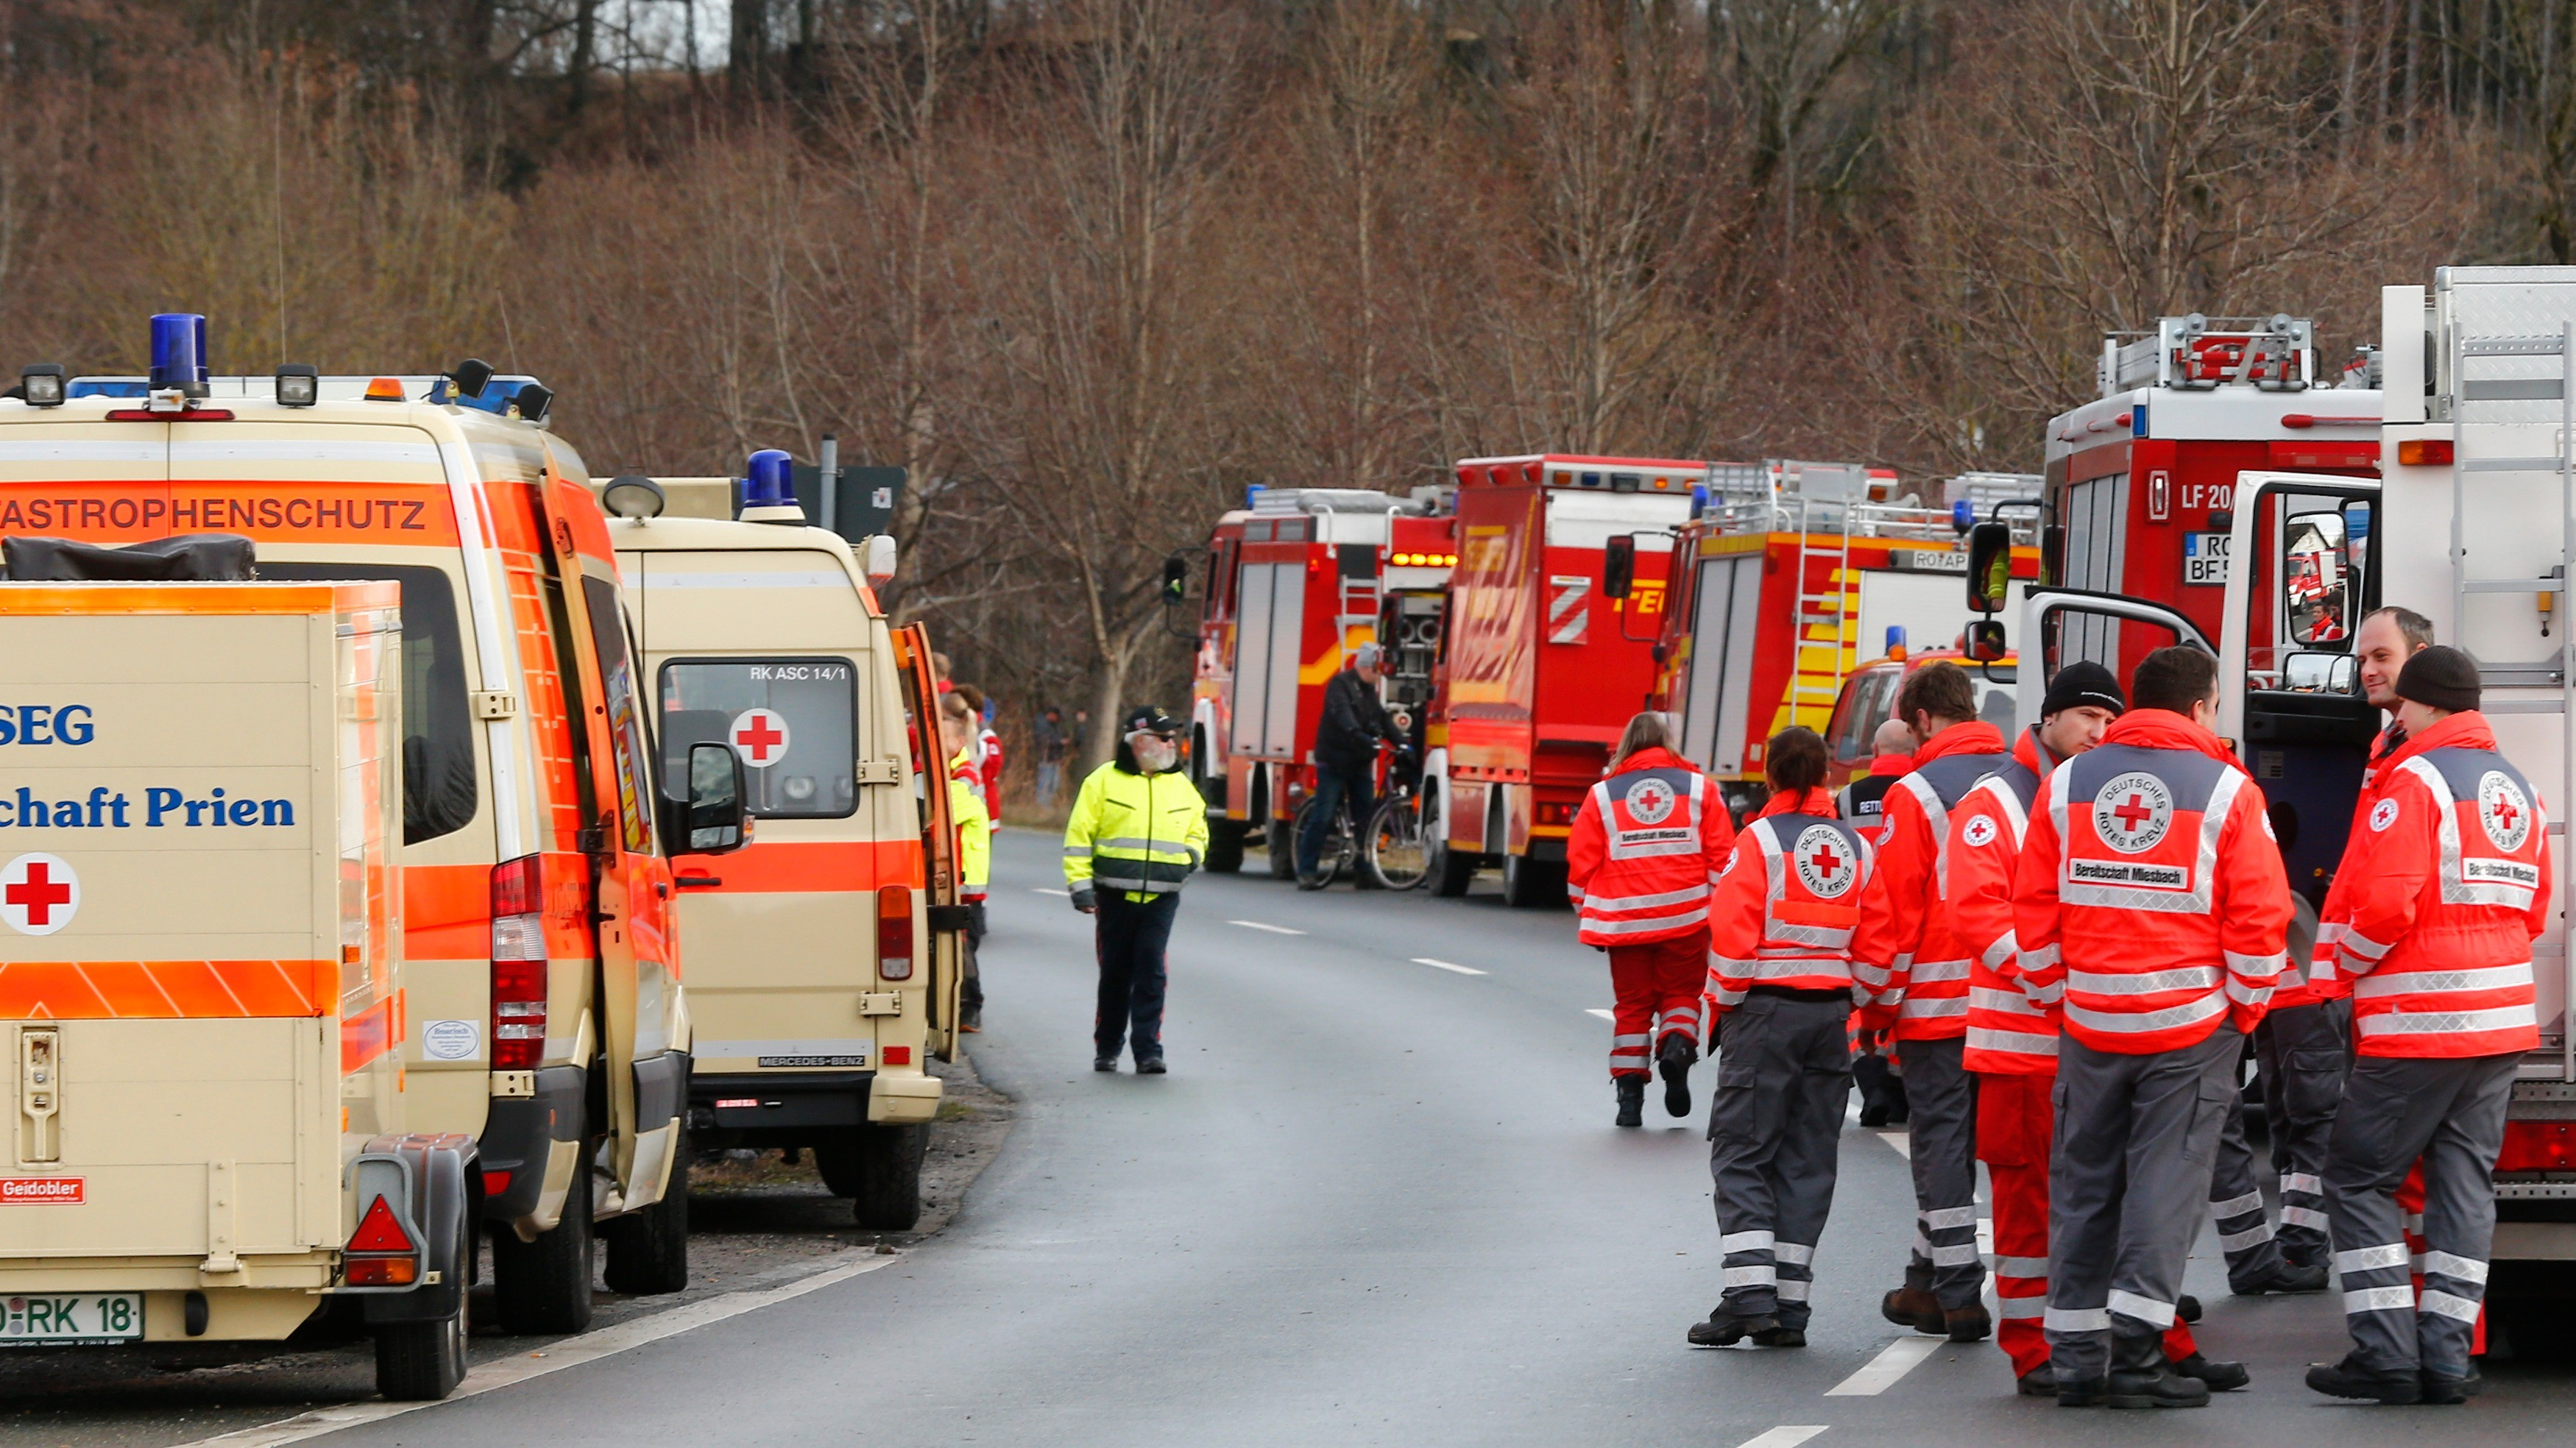 17 авто столкнулись наавтобане вГермании— Масштабное ДТП